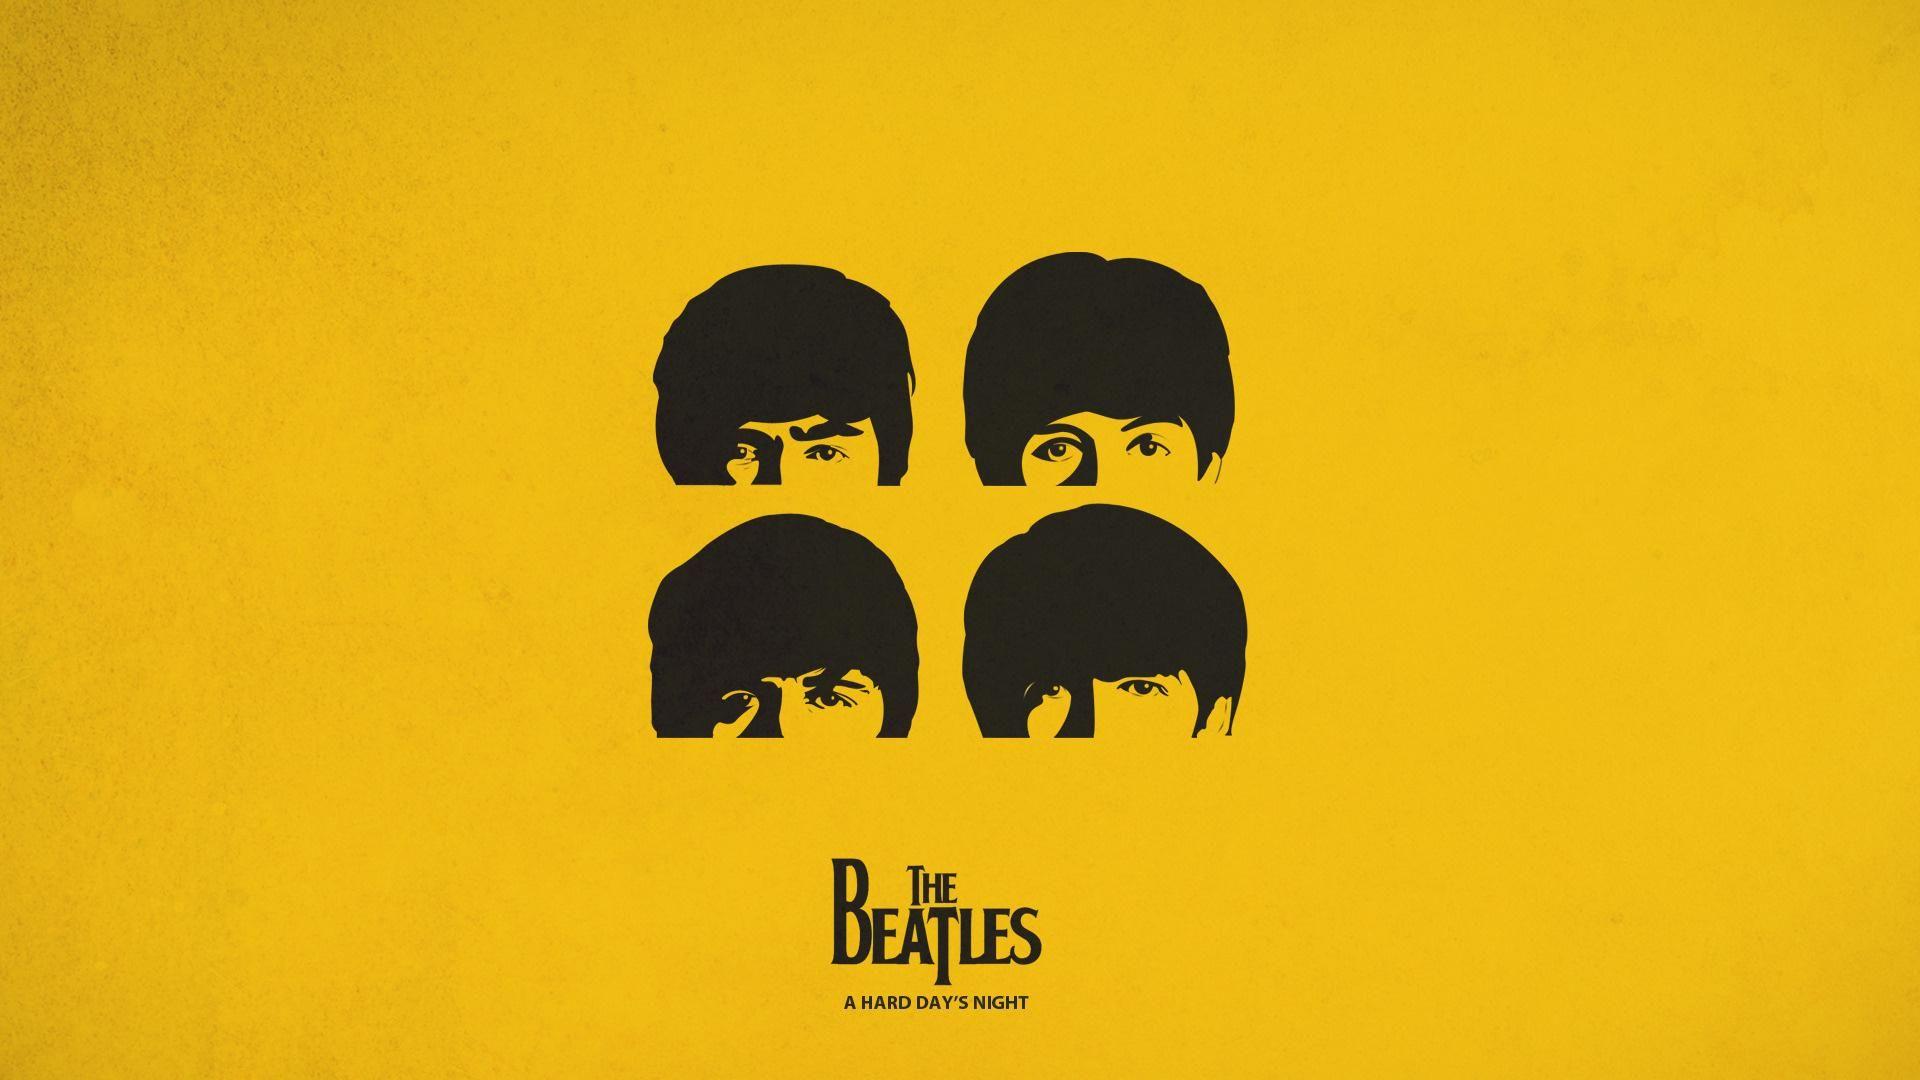 The Beatles Logo Background HD Wallpaper